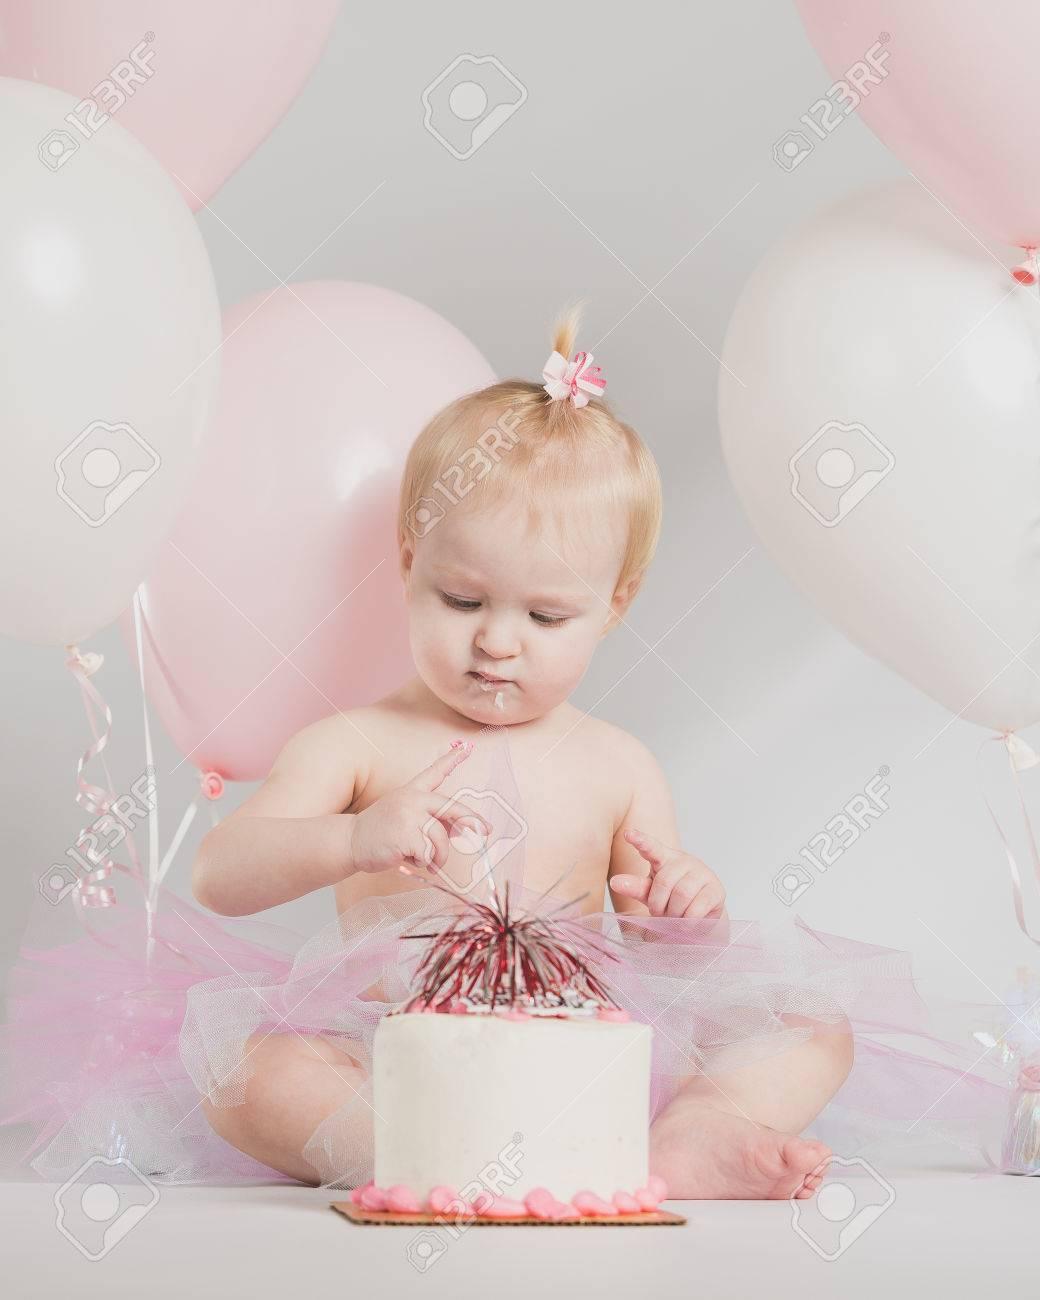 Fine One Year Old Girl Birthday Portraits With Smash Cake Stock Photo Funny Birthday Cards Online Inifodamsfinfo